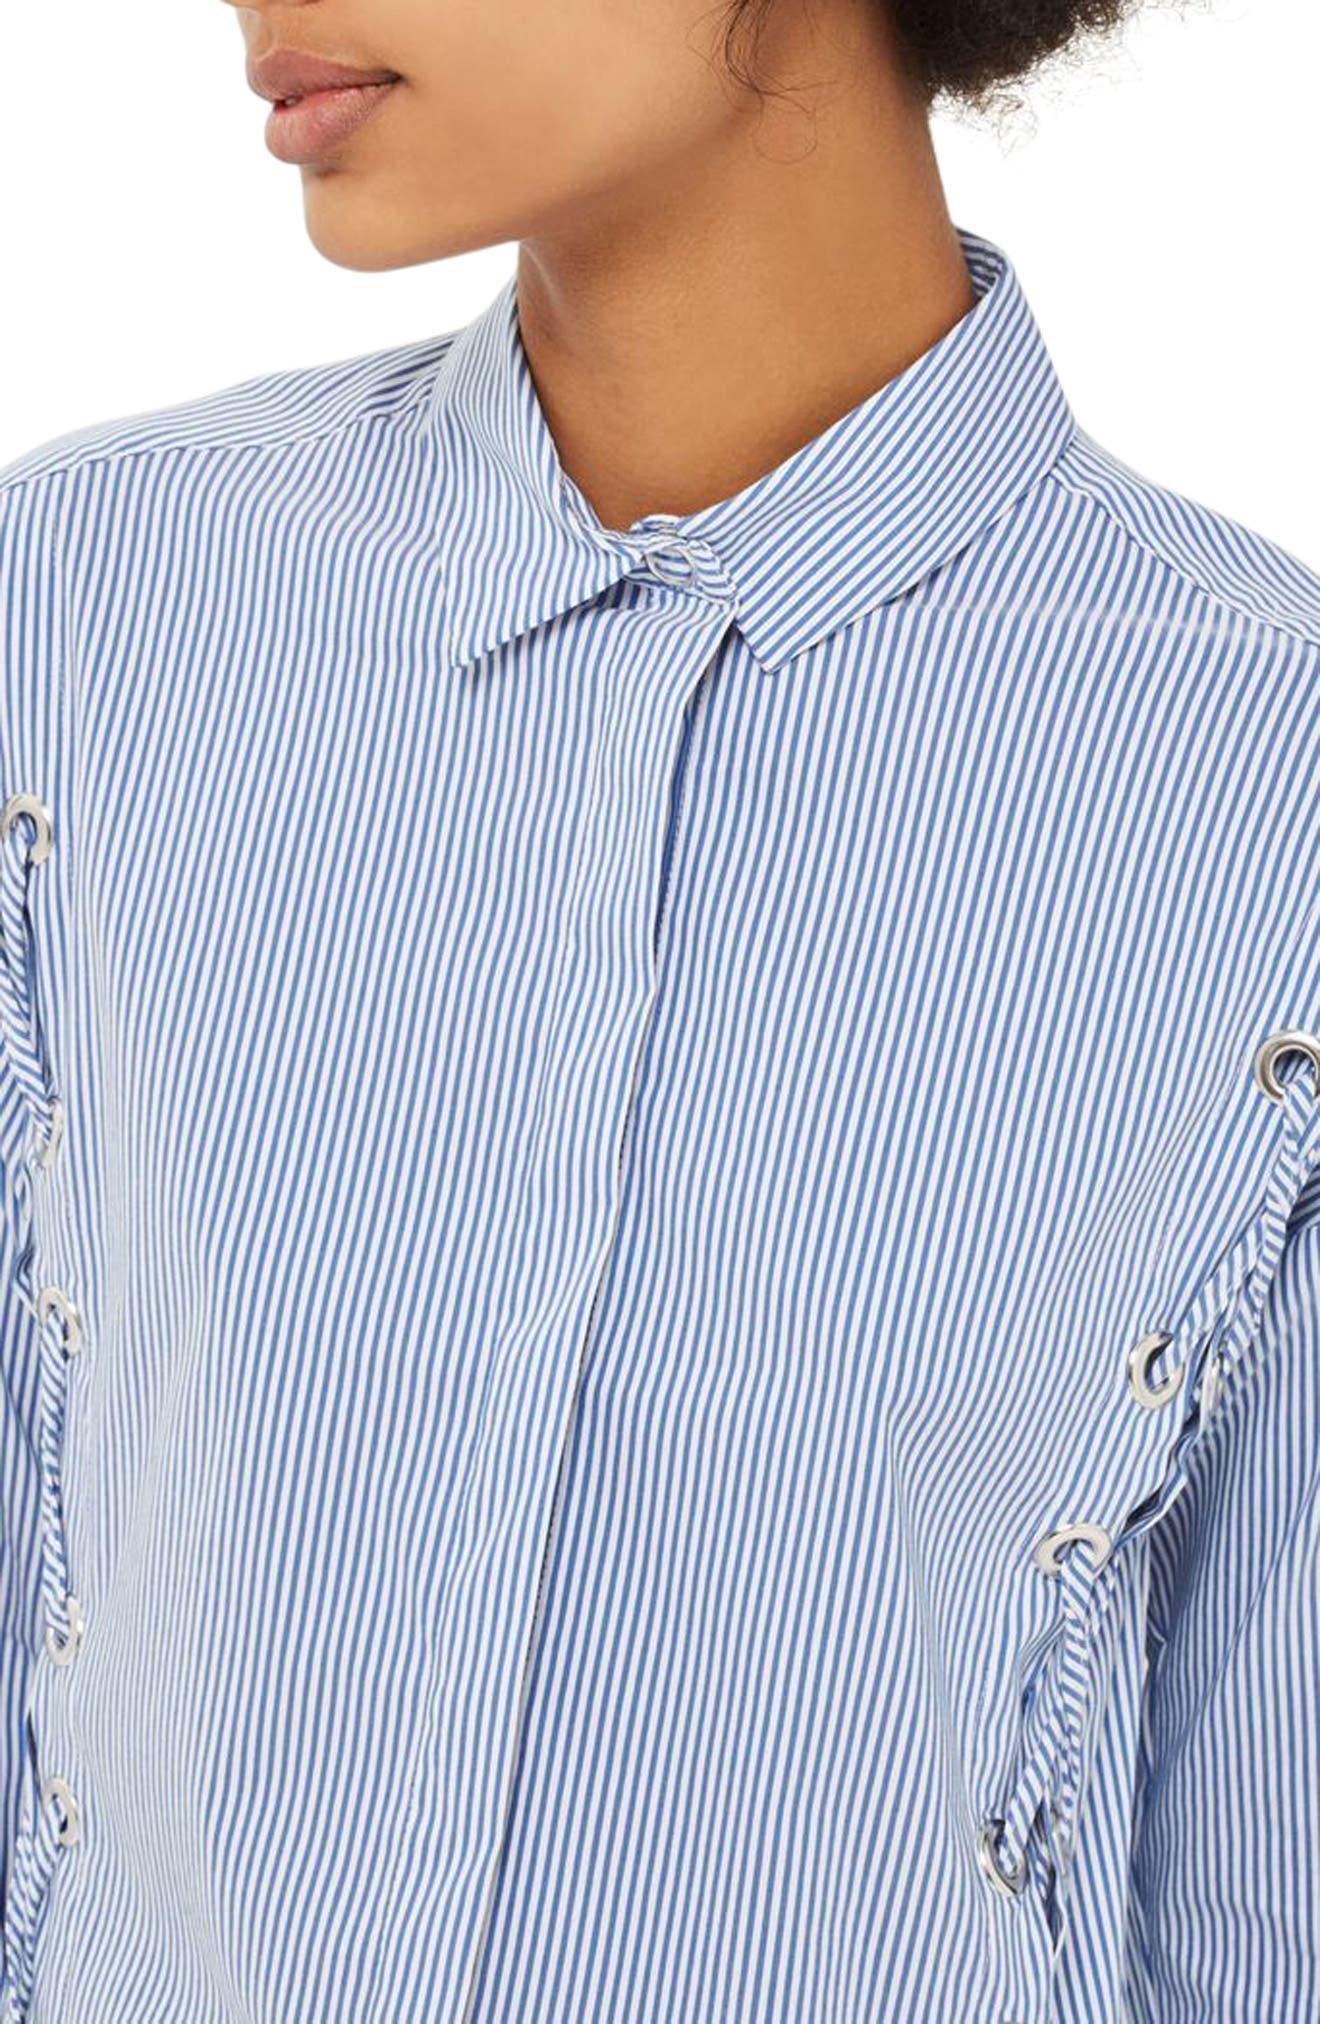 Side Lace-Up Shirt,                         Main,                         color, 400